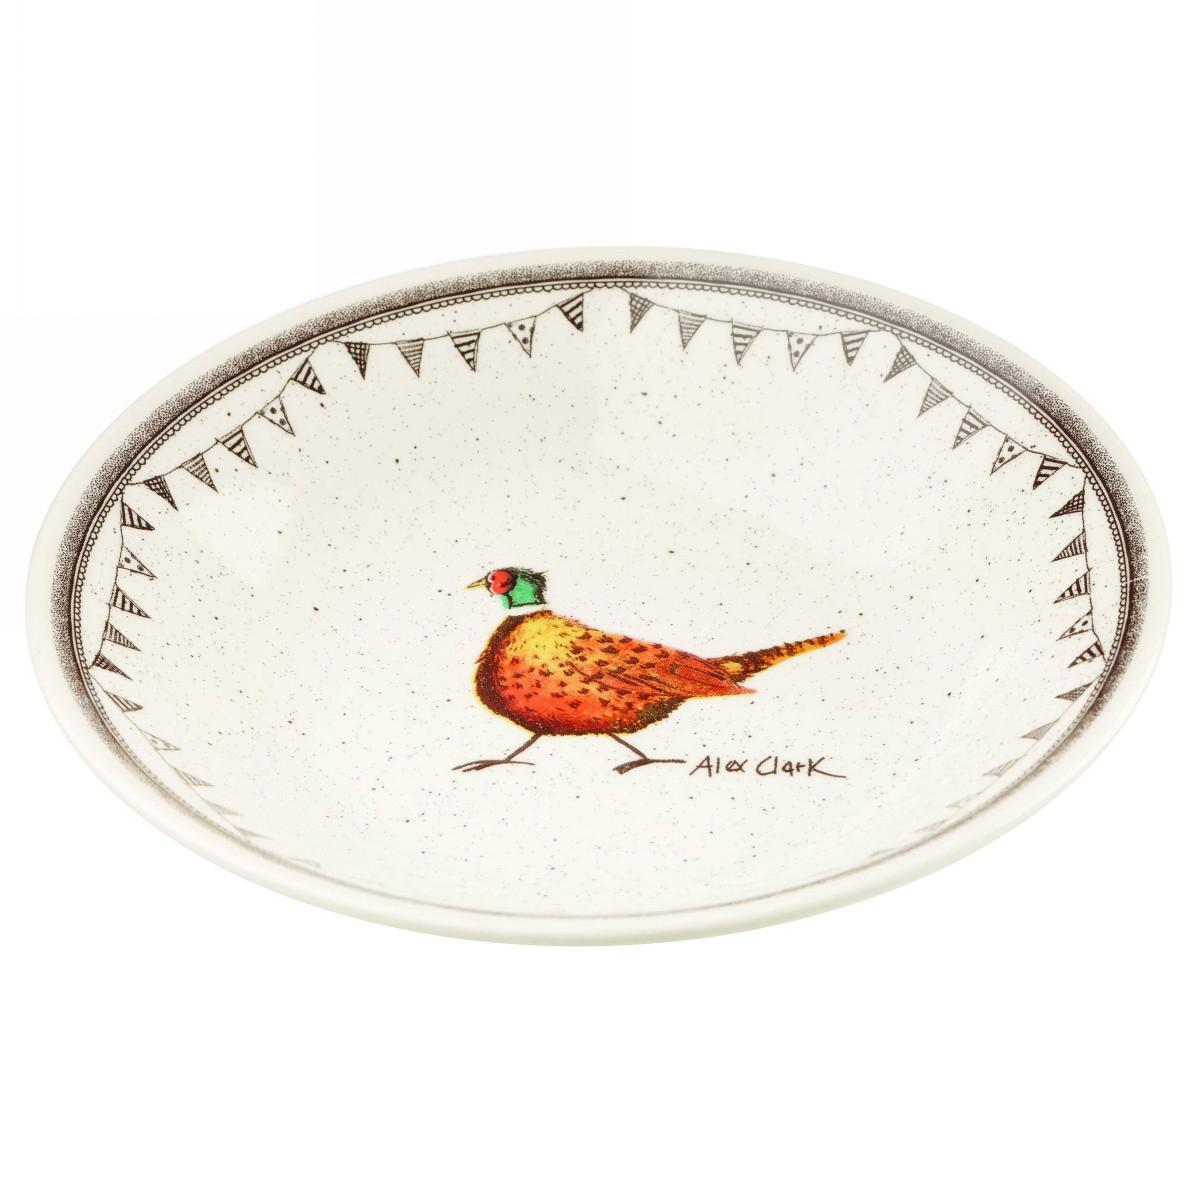 Тарелка суповая Churchill 20 см Живая природа от Алекс Кларк